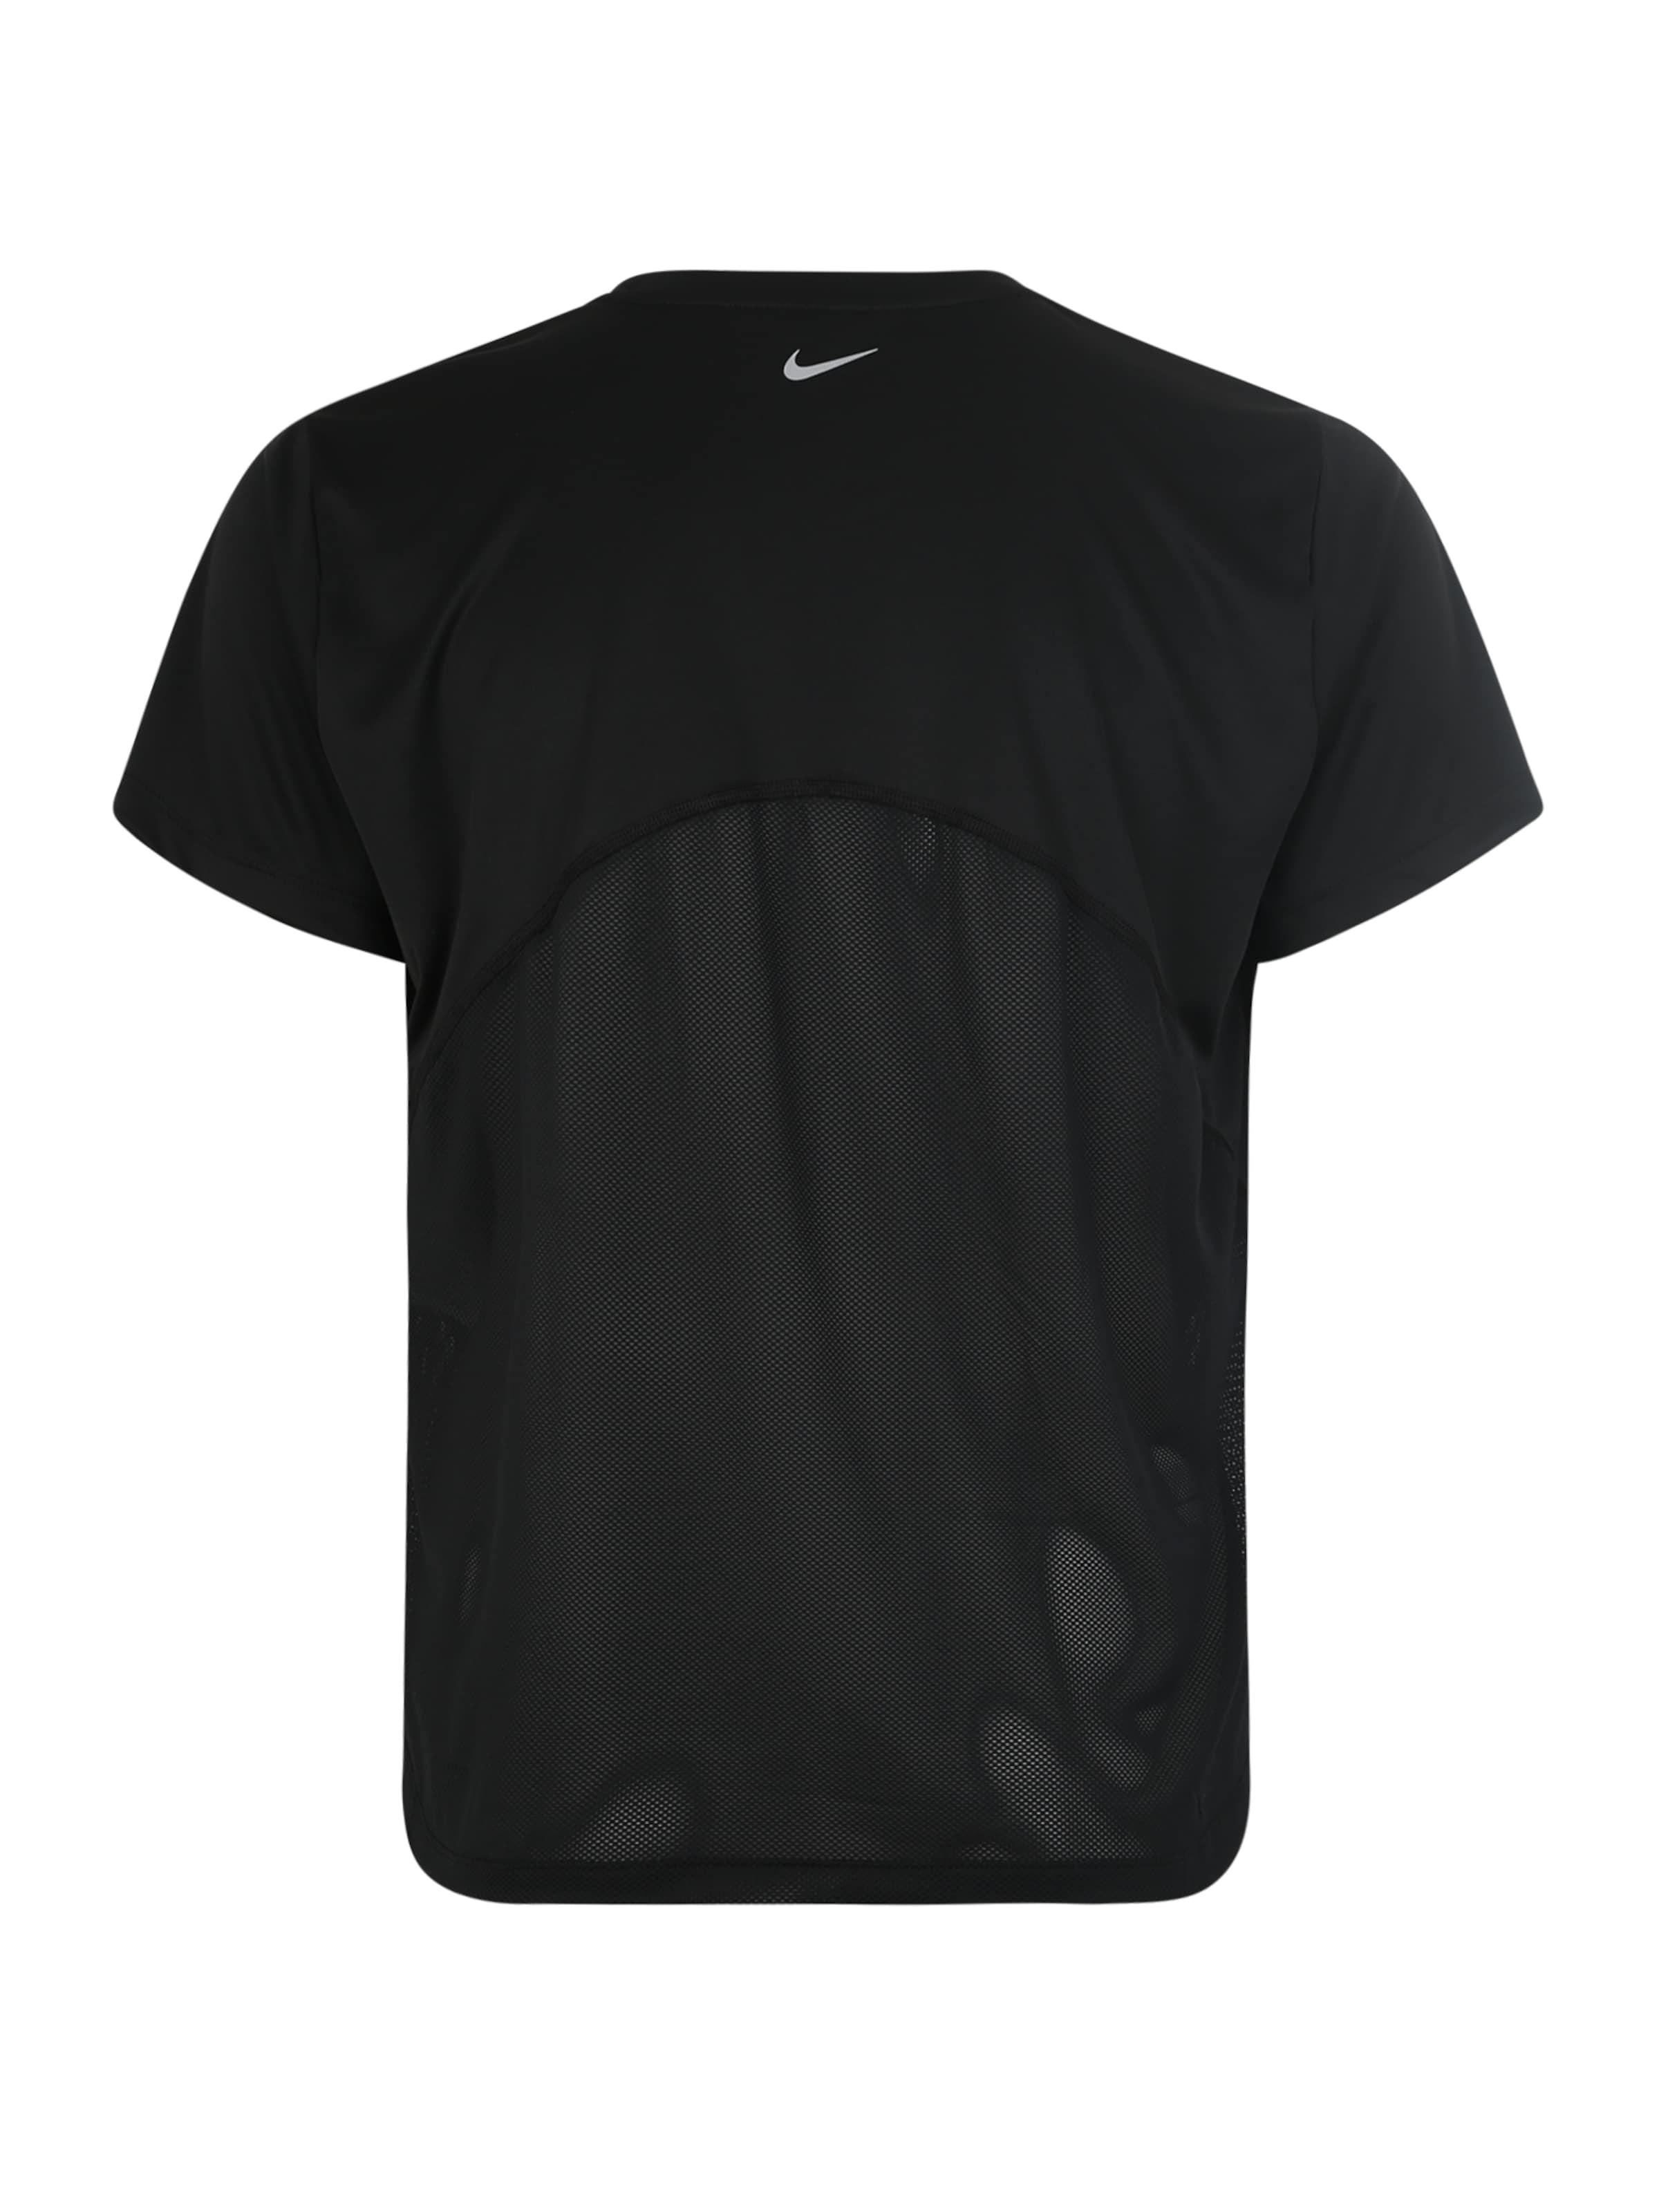 Sport SchwarzSilber shirt 'nike In Nike Miler' uKcF5lJ31T